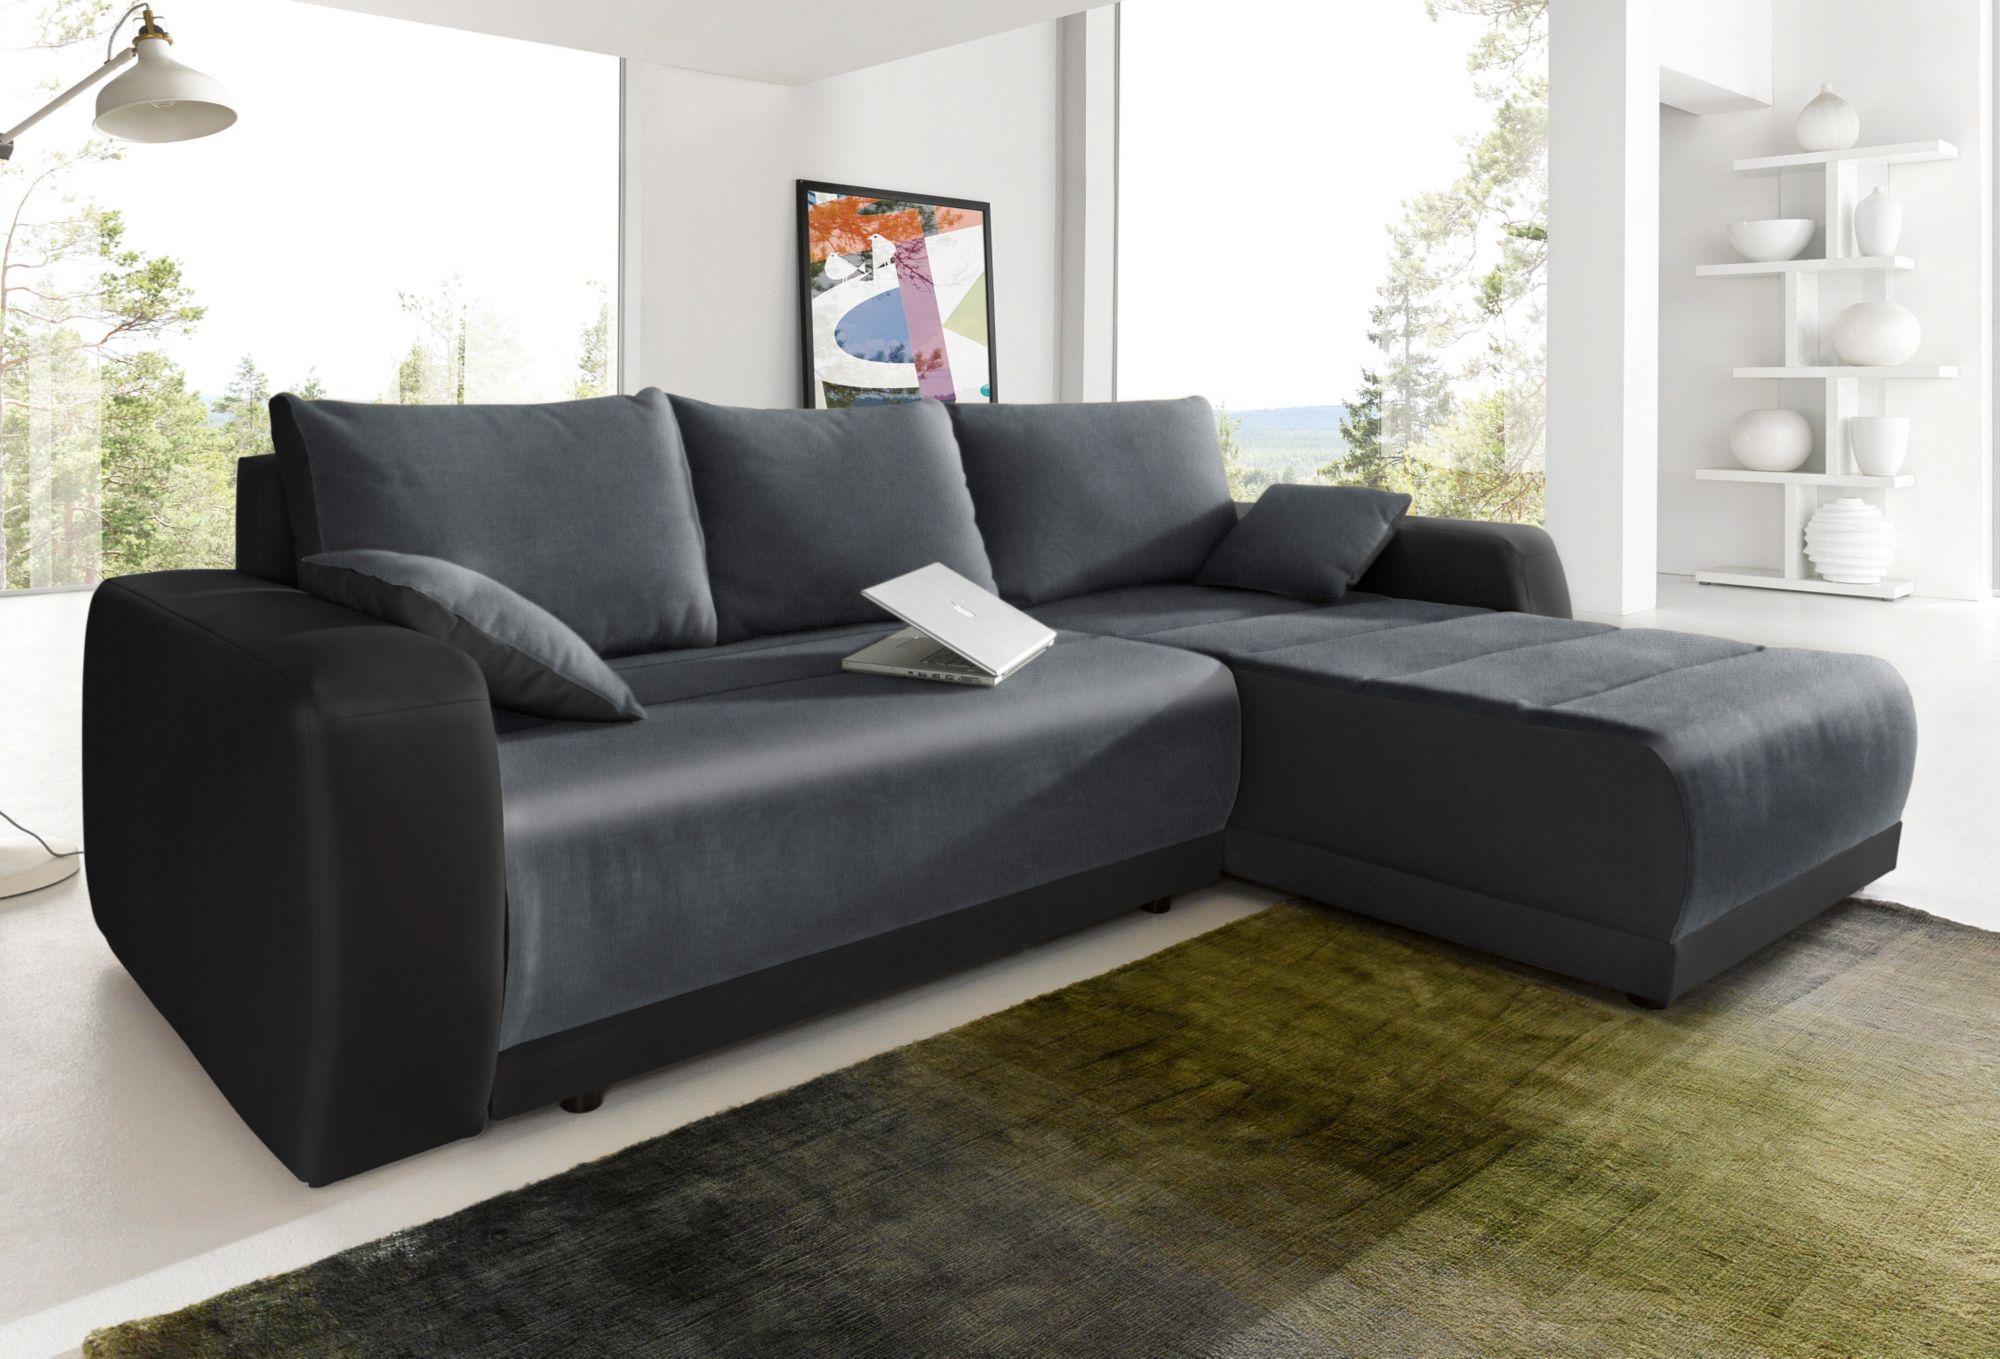 Polsterecke sit more wahlweise mit bettfunktion schwab versand sofas couches Sofa primabelle